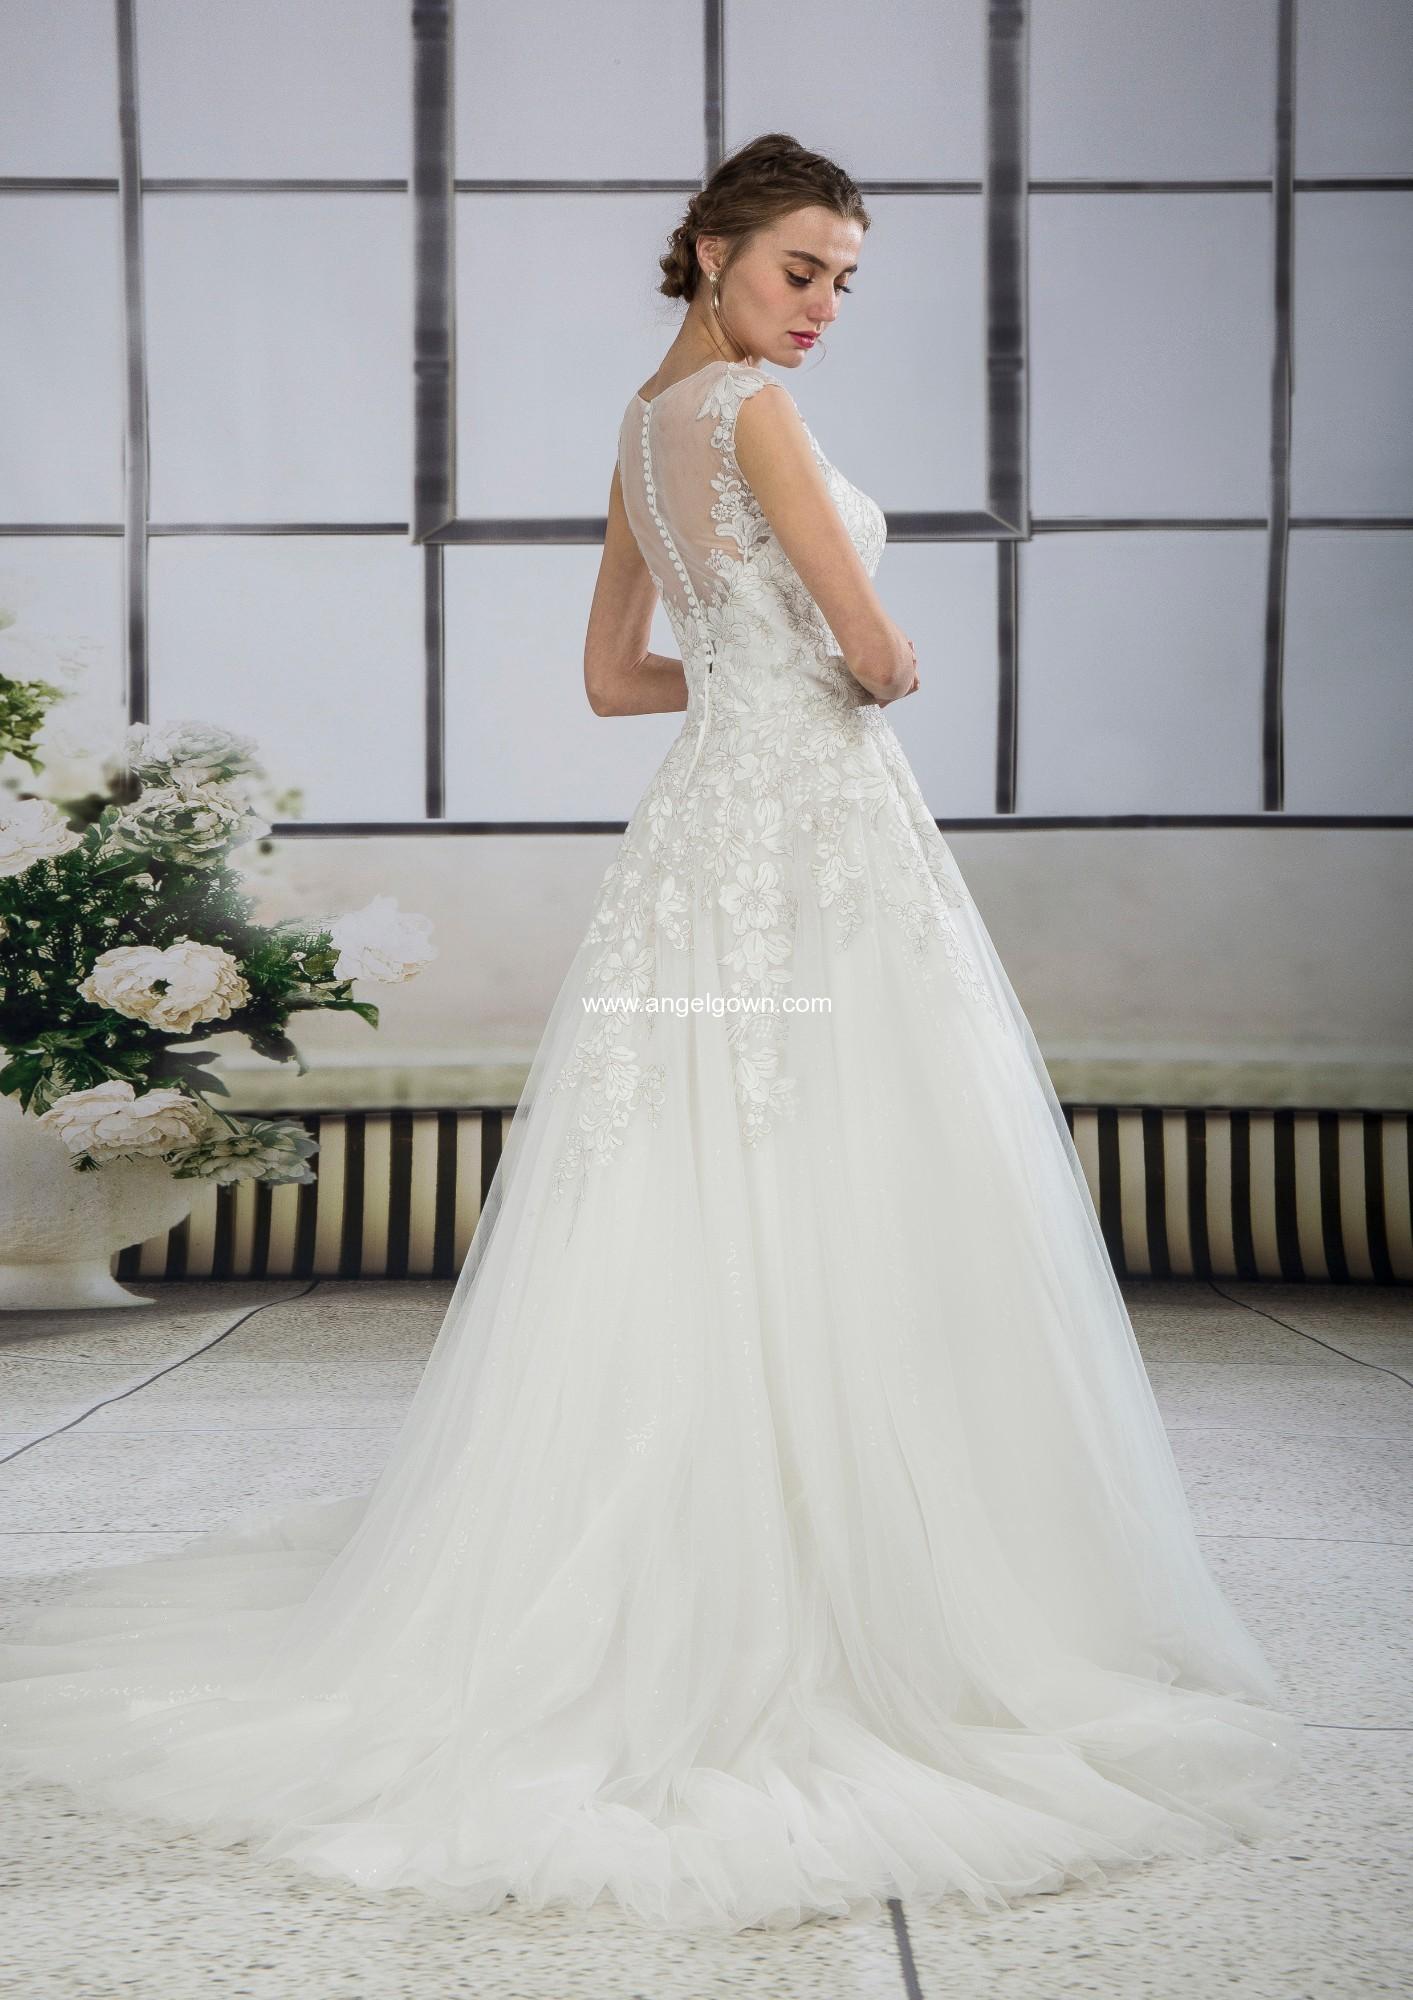 Fshion Wedding Dress Trends of 2014!